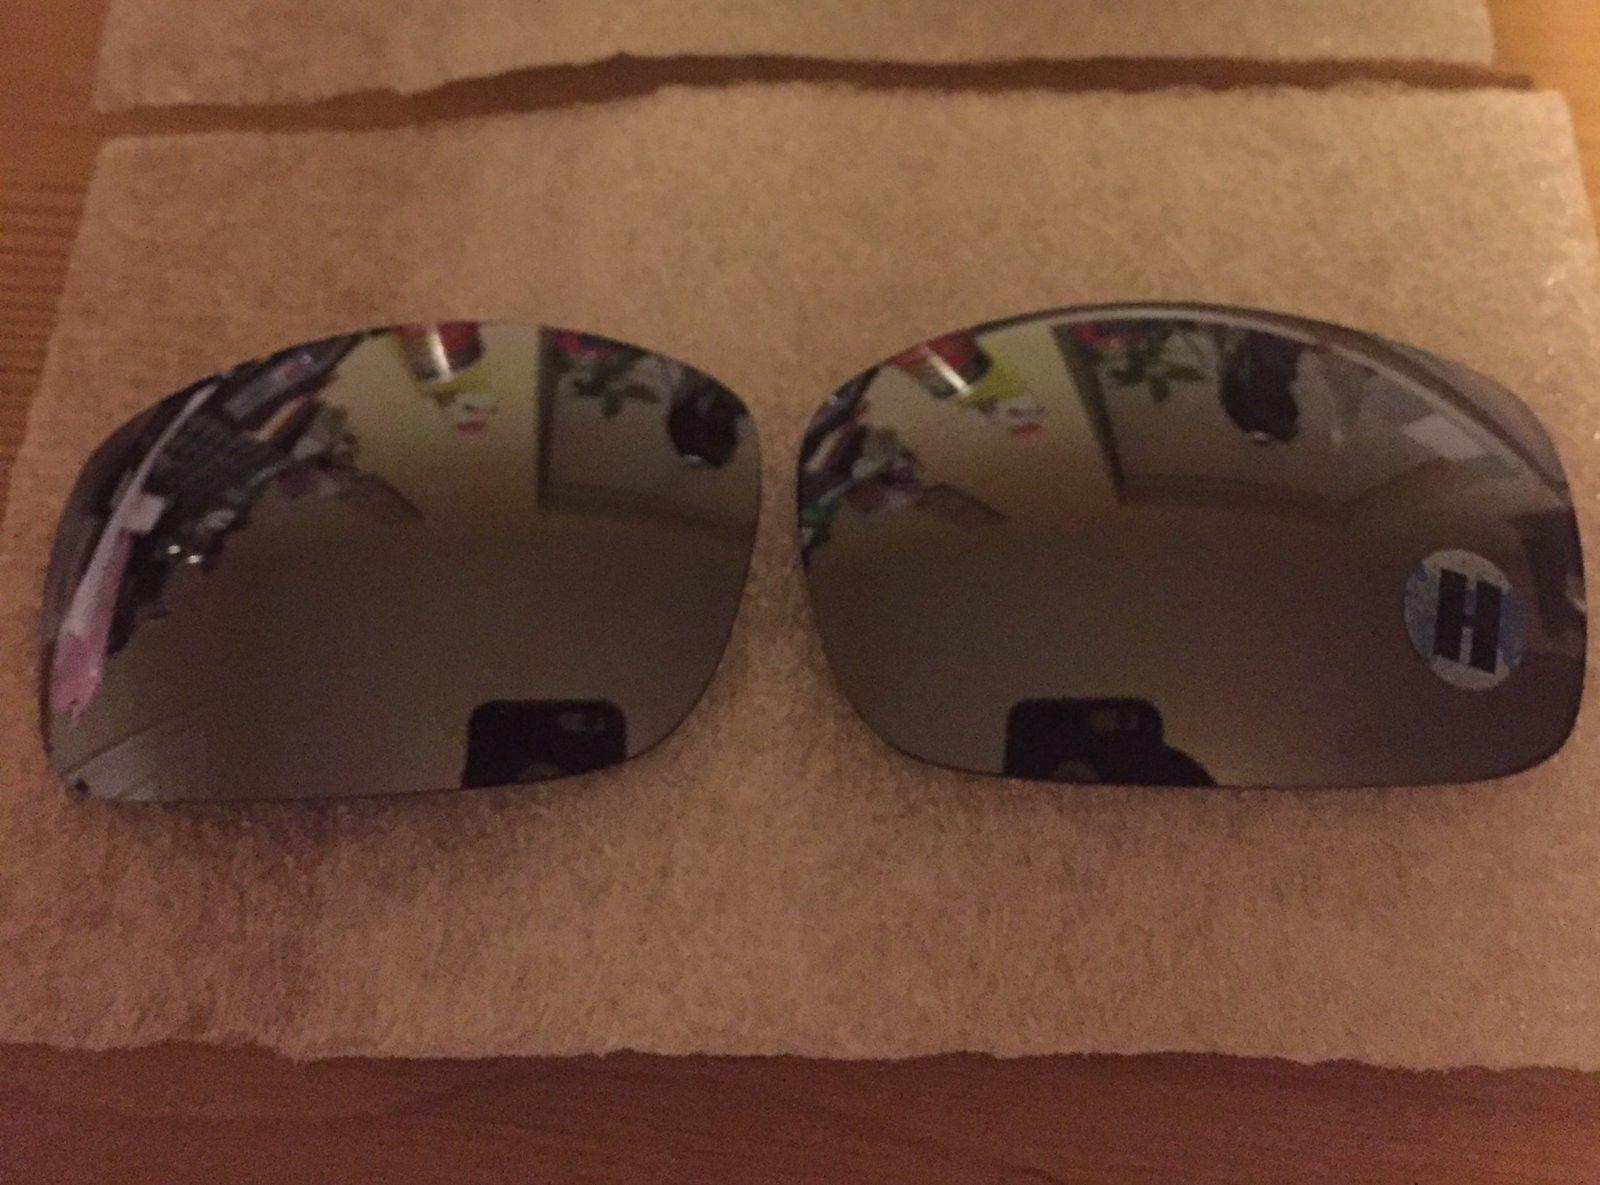 110usd Ducati lenses for XS;BNEW - image.jpeg